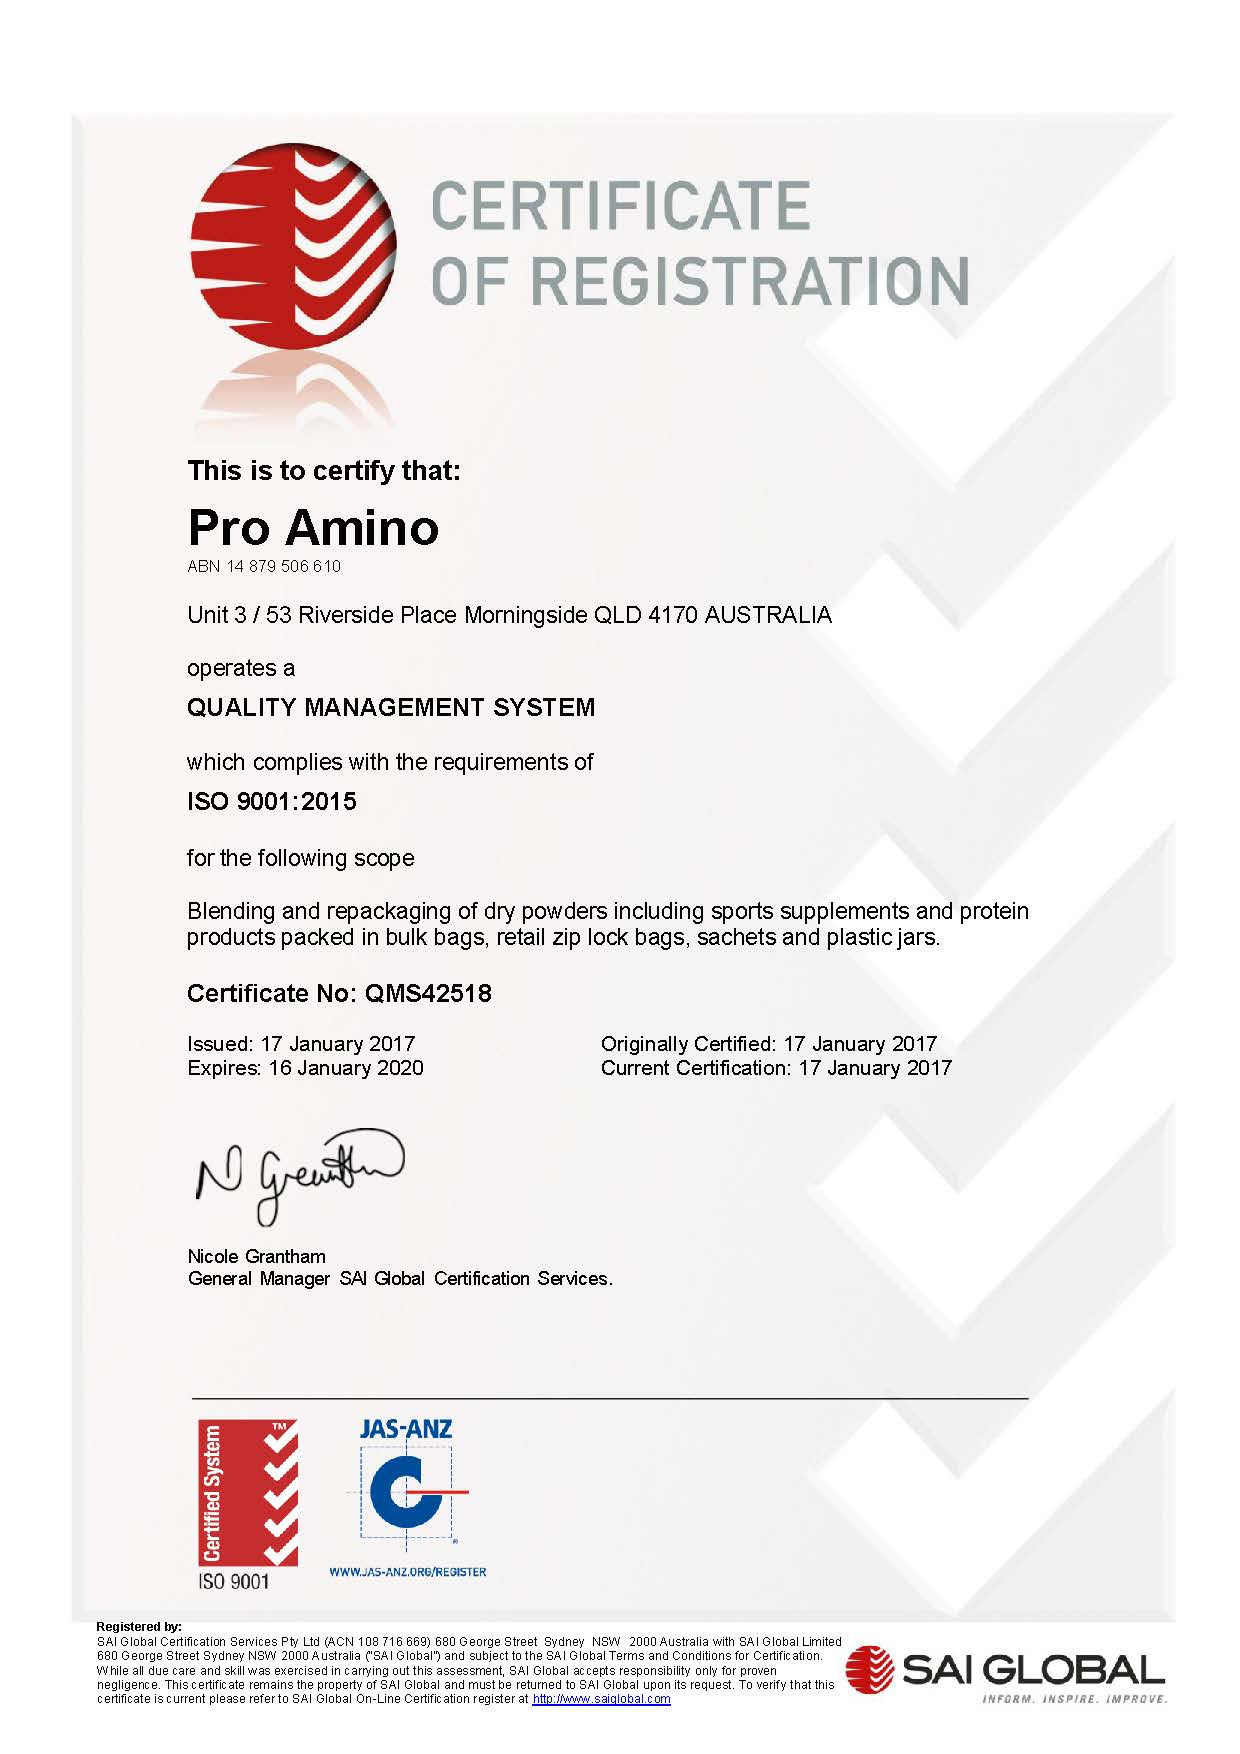 Accreditations pro amino certificate qms42518 20170117 yadclub Choice Image